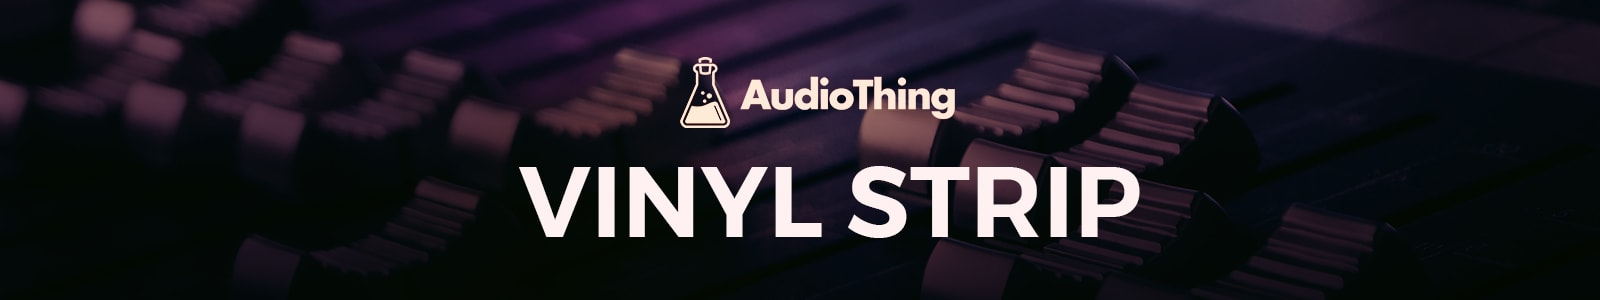 vinyl strip by audiothing